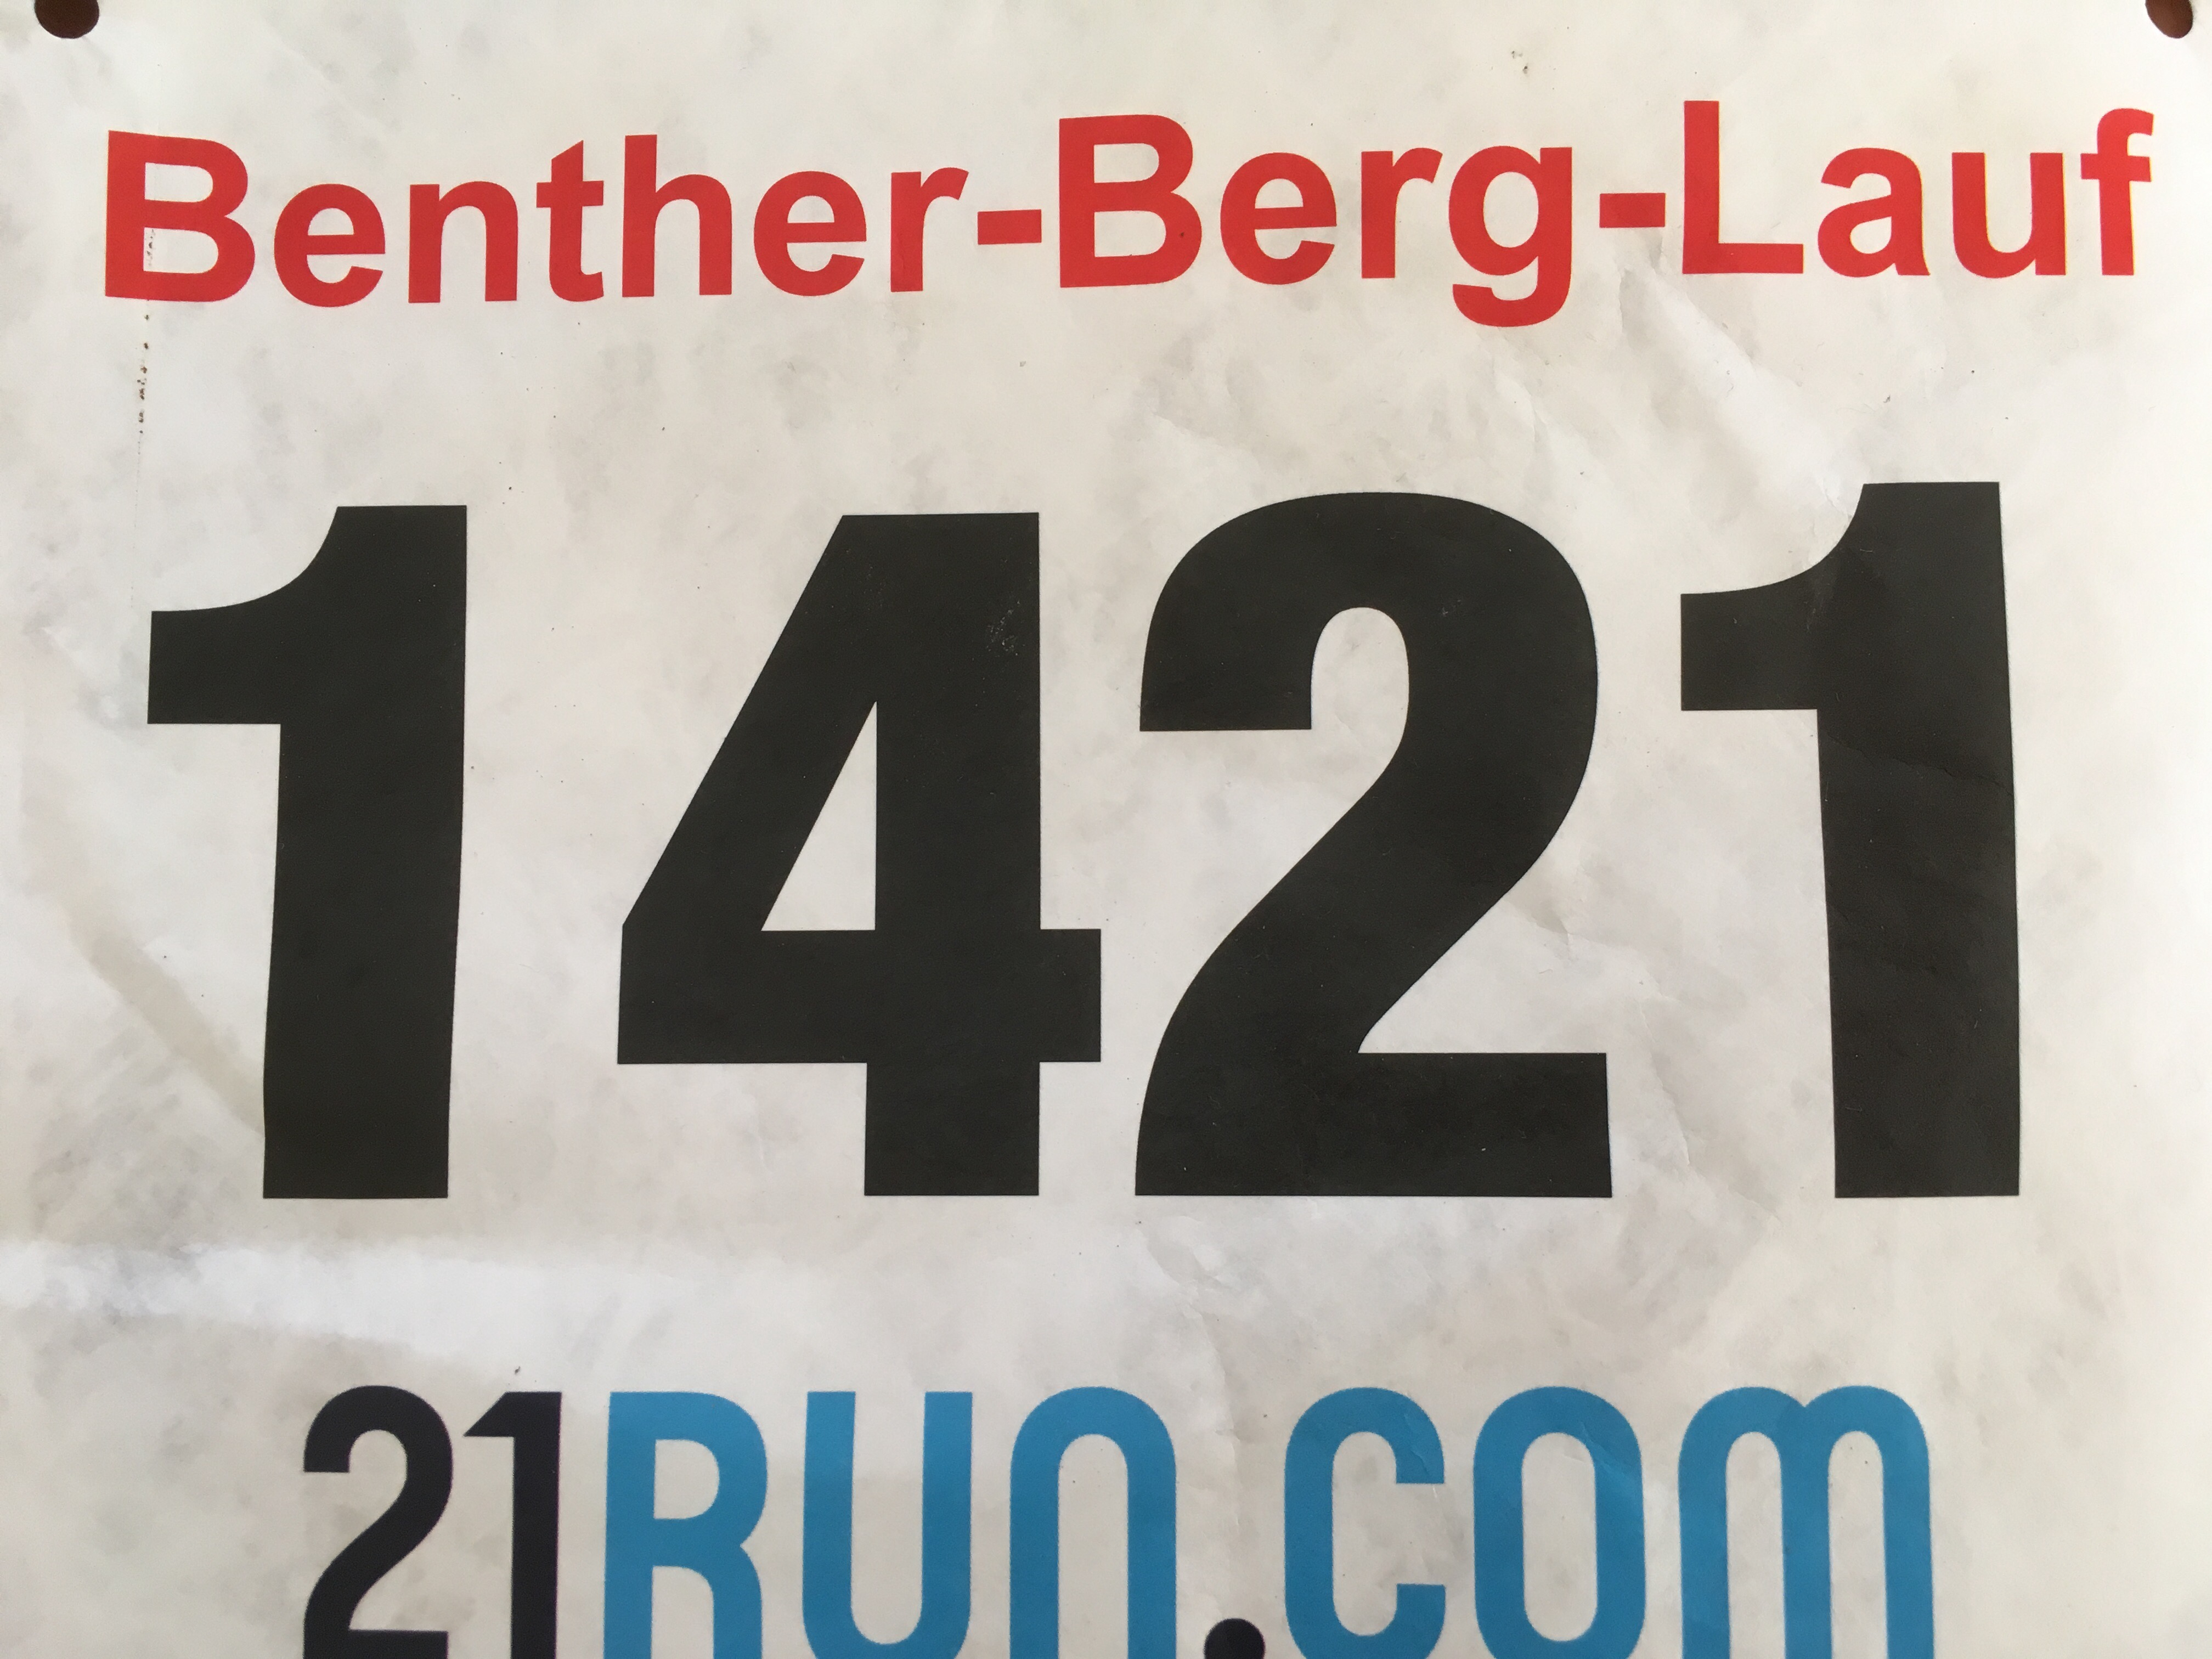 Benther-Berg-Lauf 2018